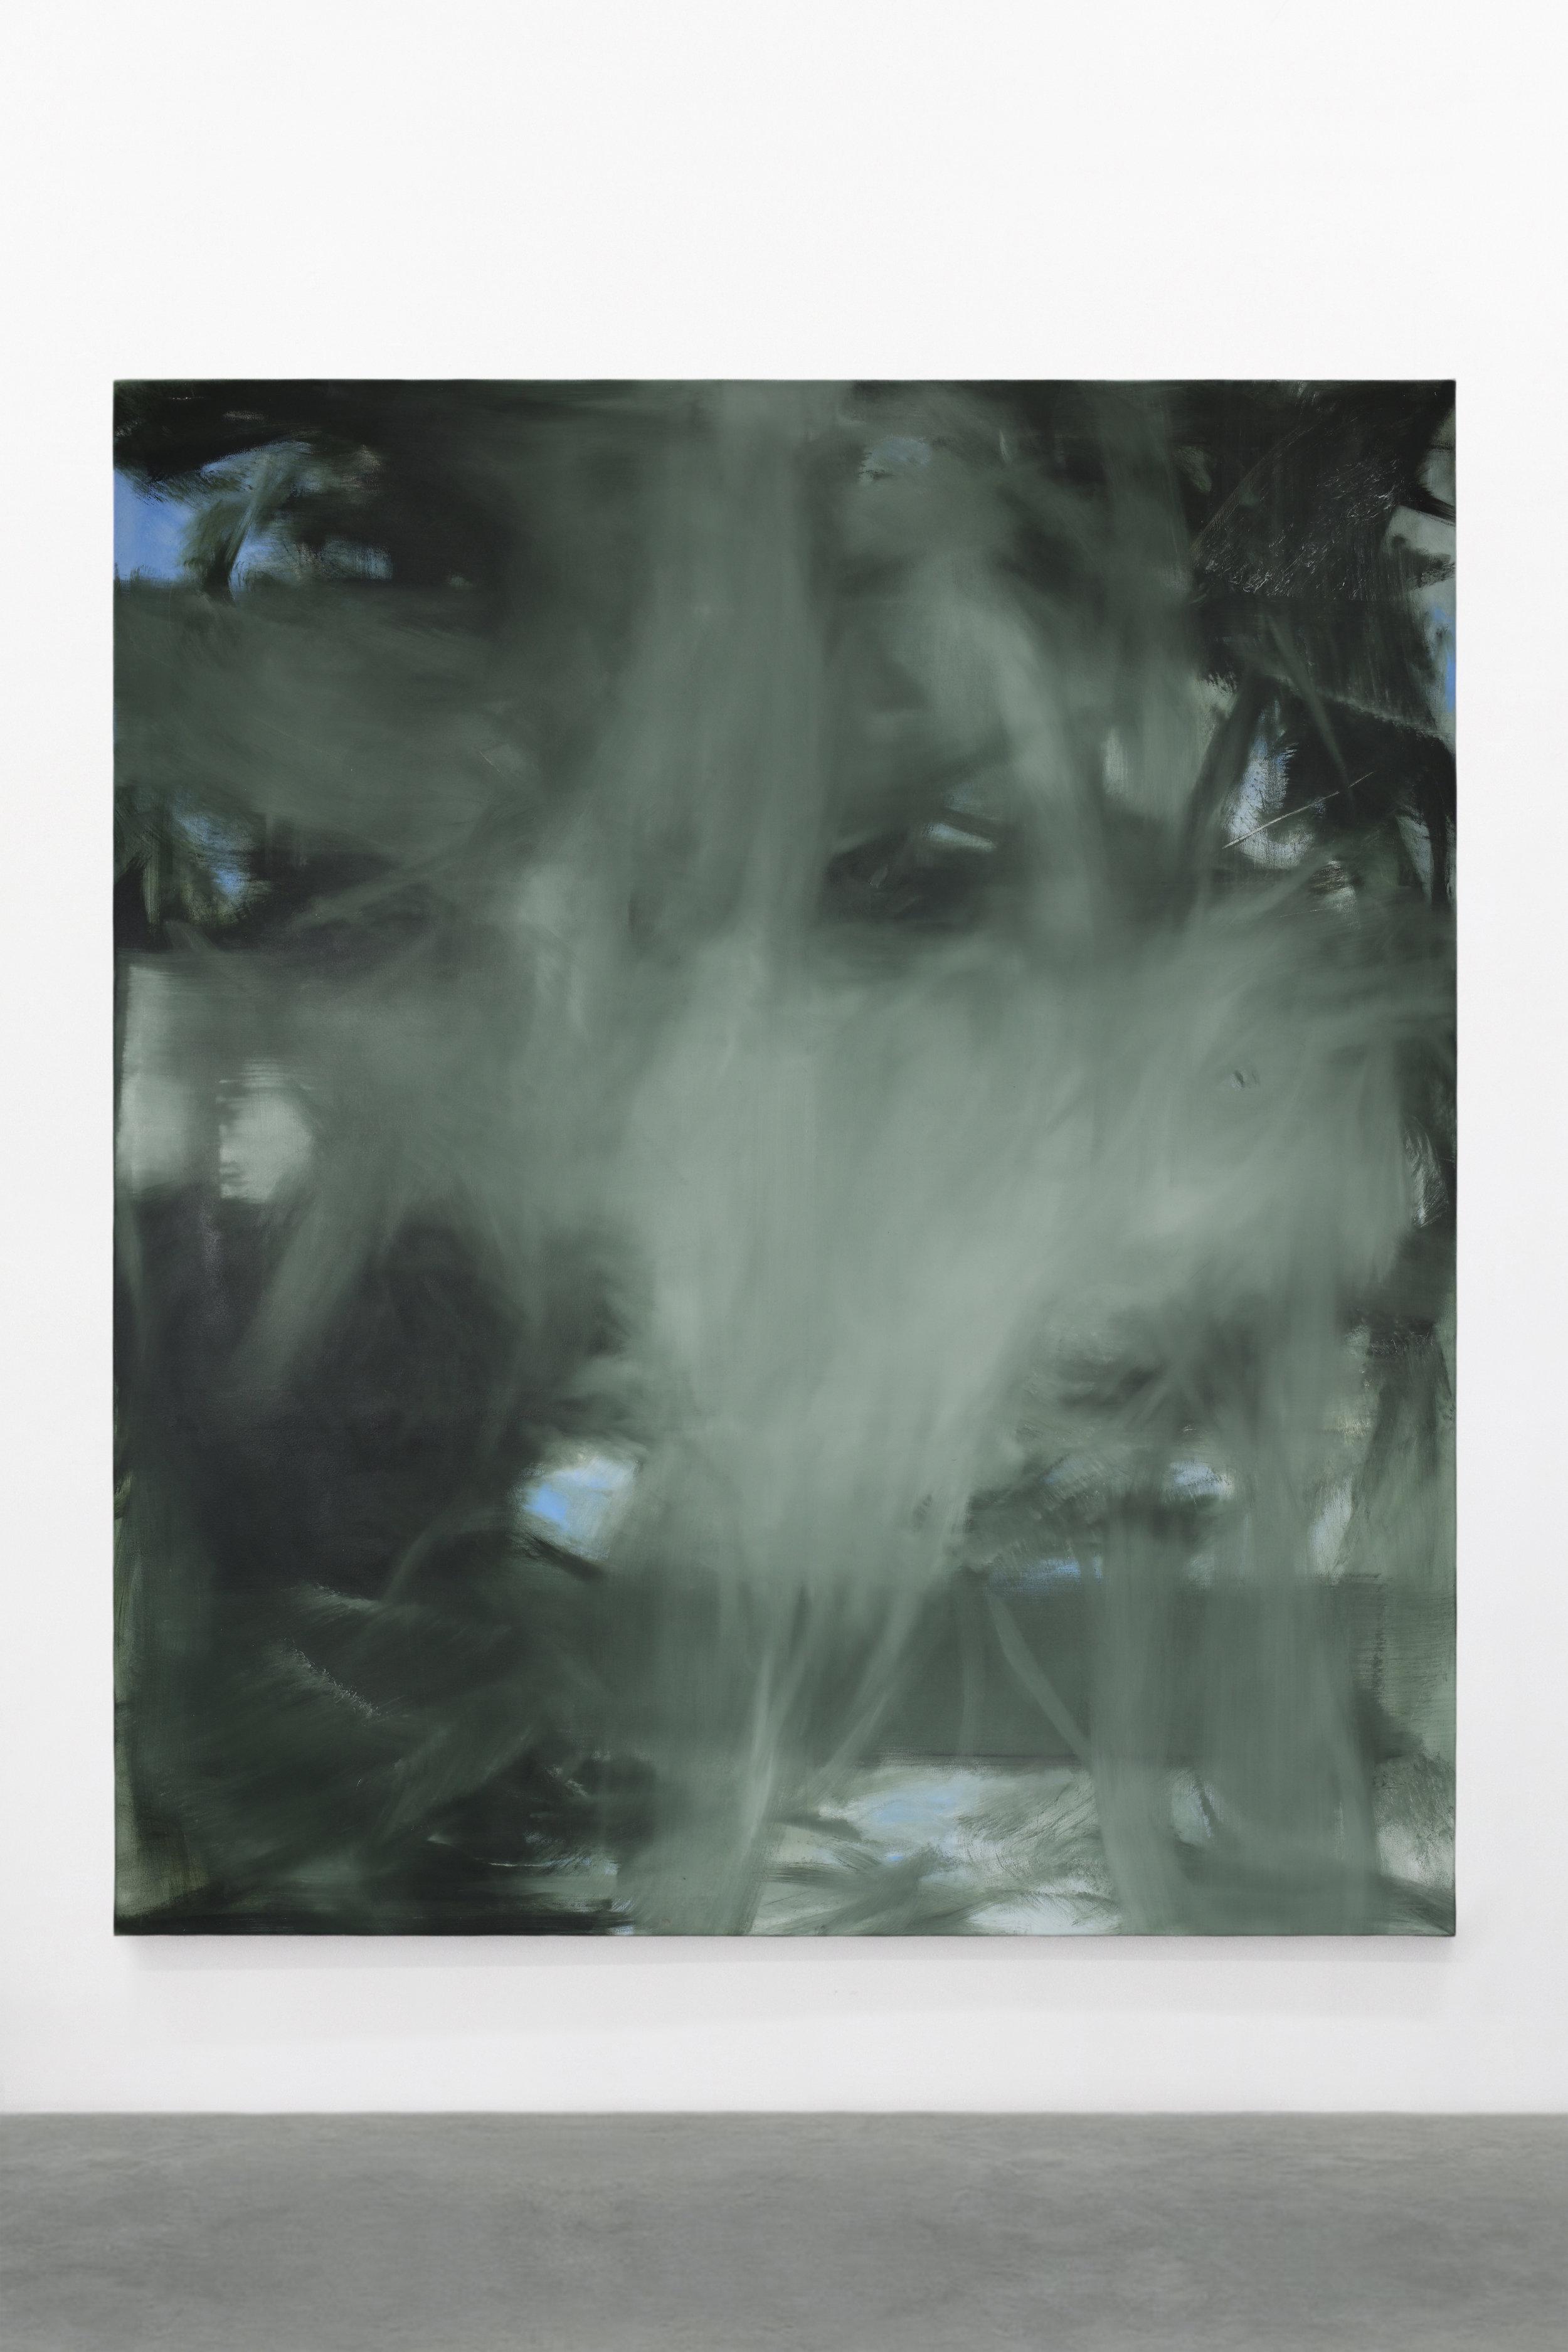 S. Derviz, Unititled, oil on canvas, 220x190cm, 2018